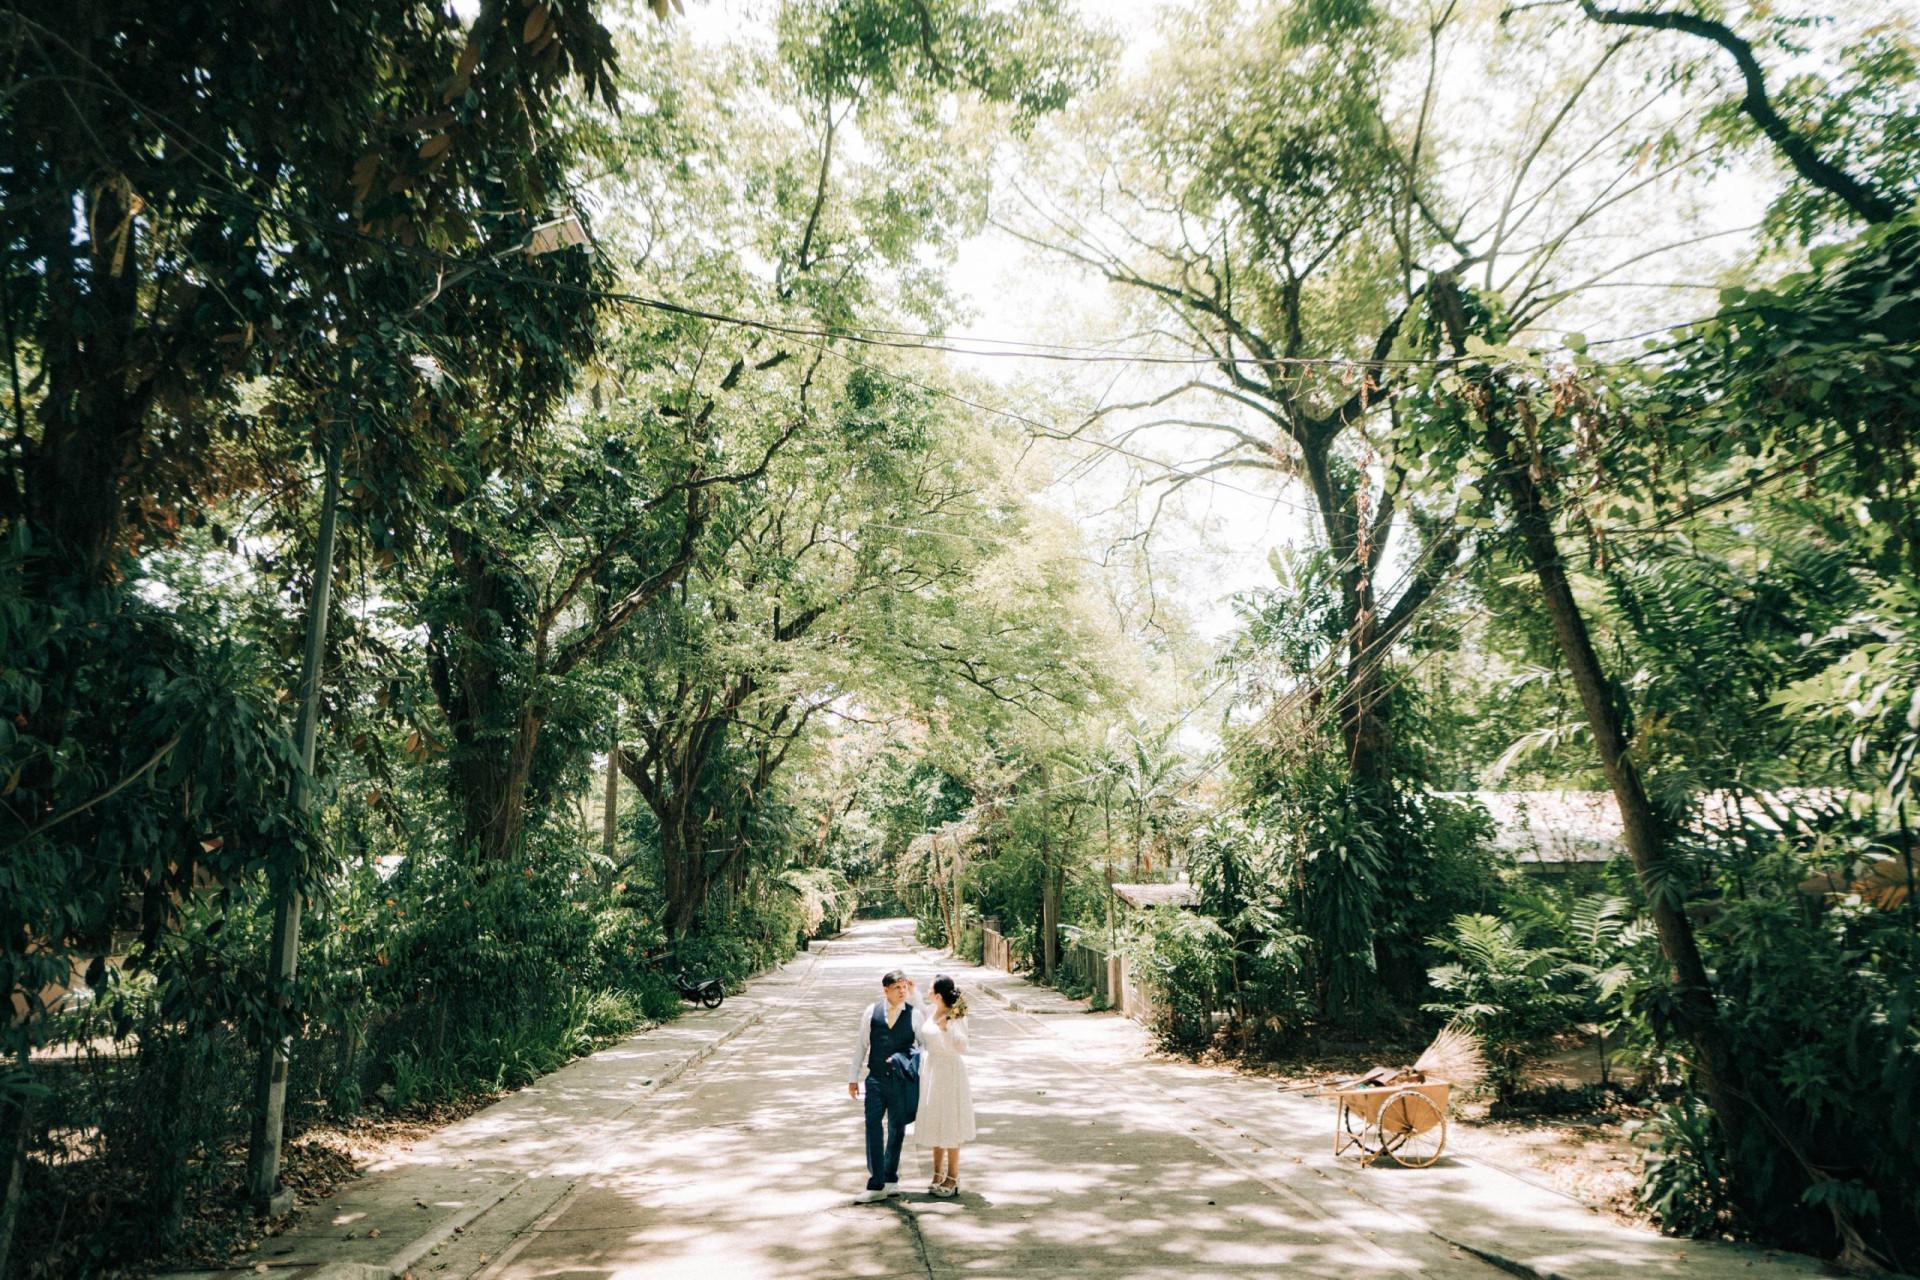 Oak St. Studios - Garp and Lois- Intimate Wedding Photographer